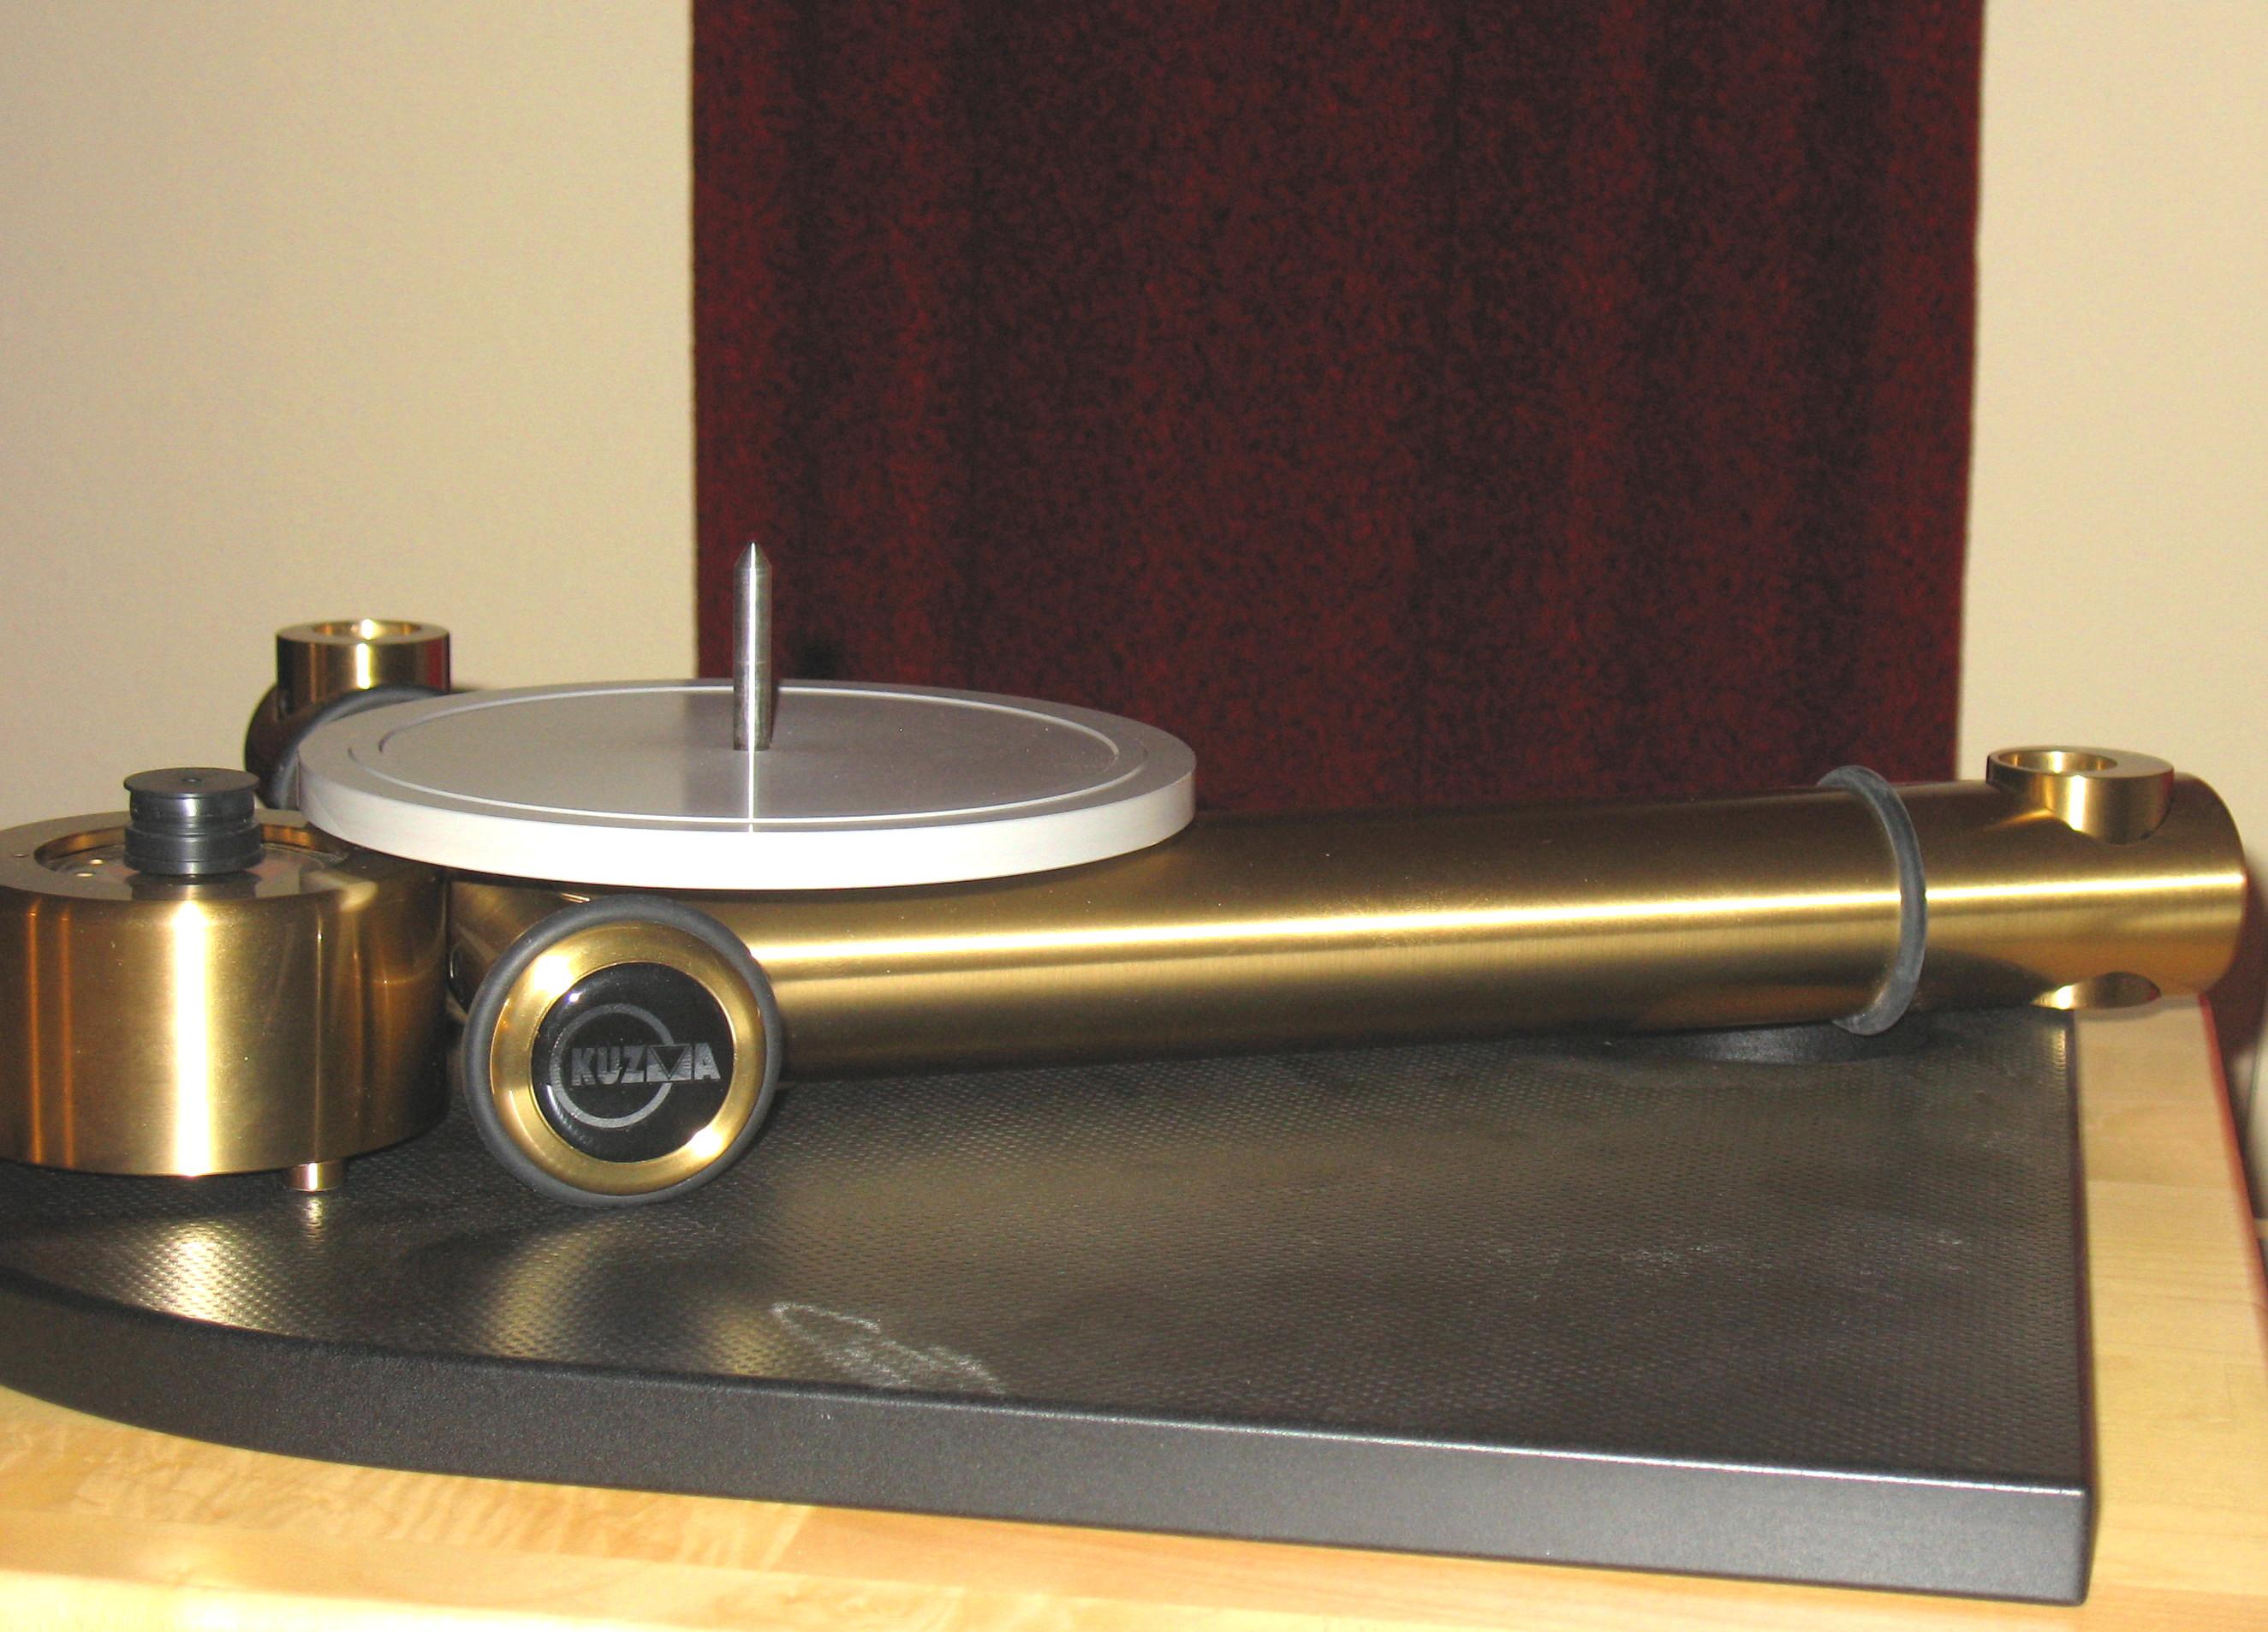 Stabi Sd 9 Amp 12 Inch Kuzma Professional Turntables Tonearms And